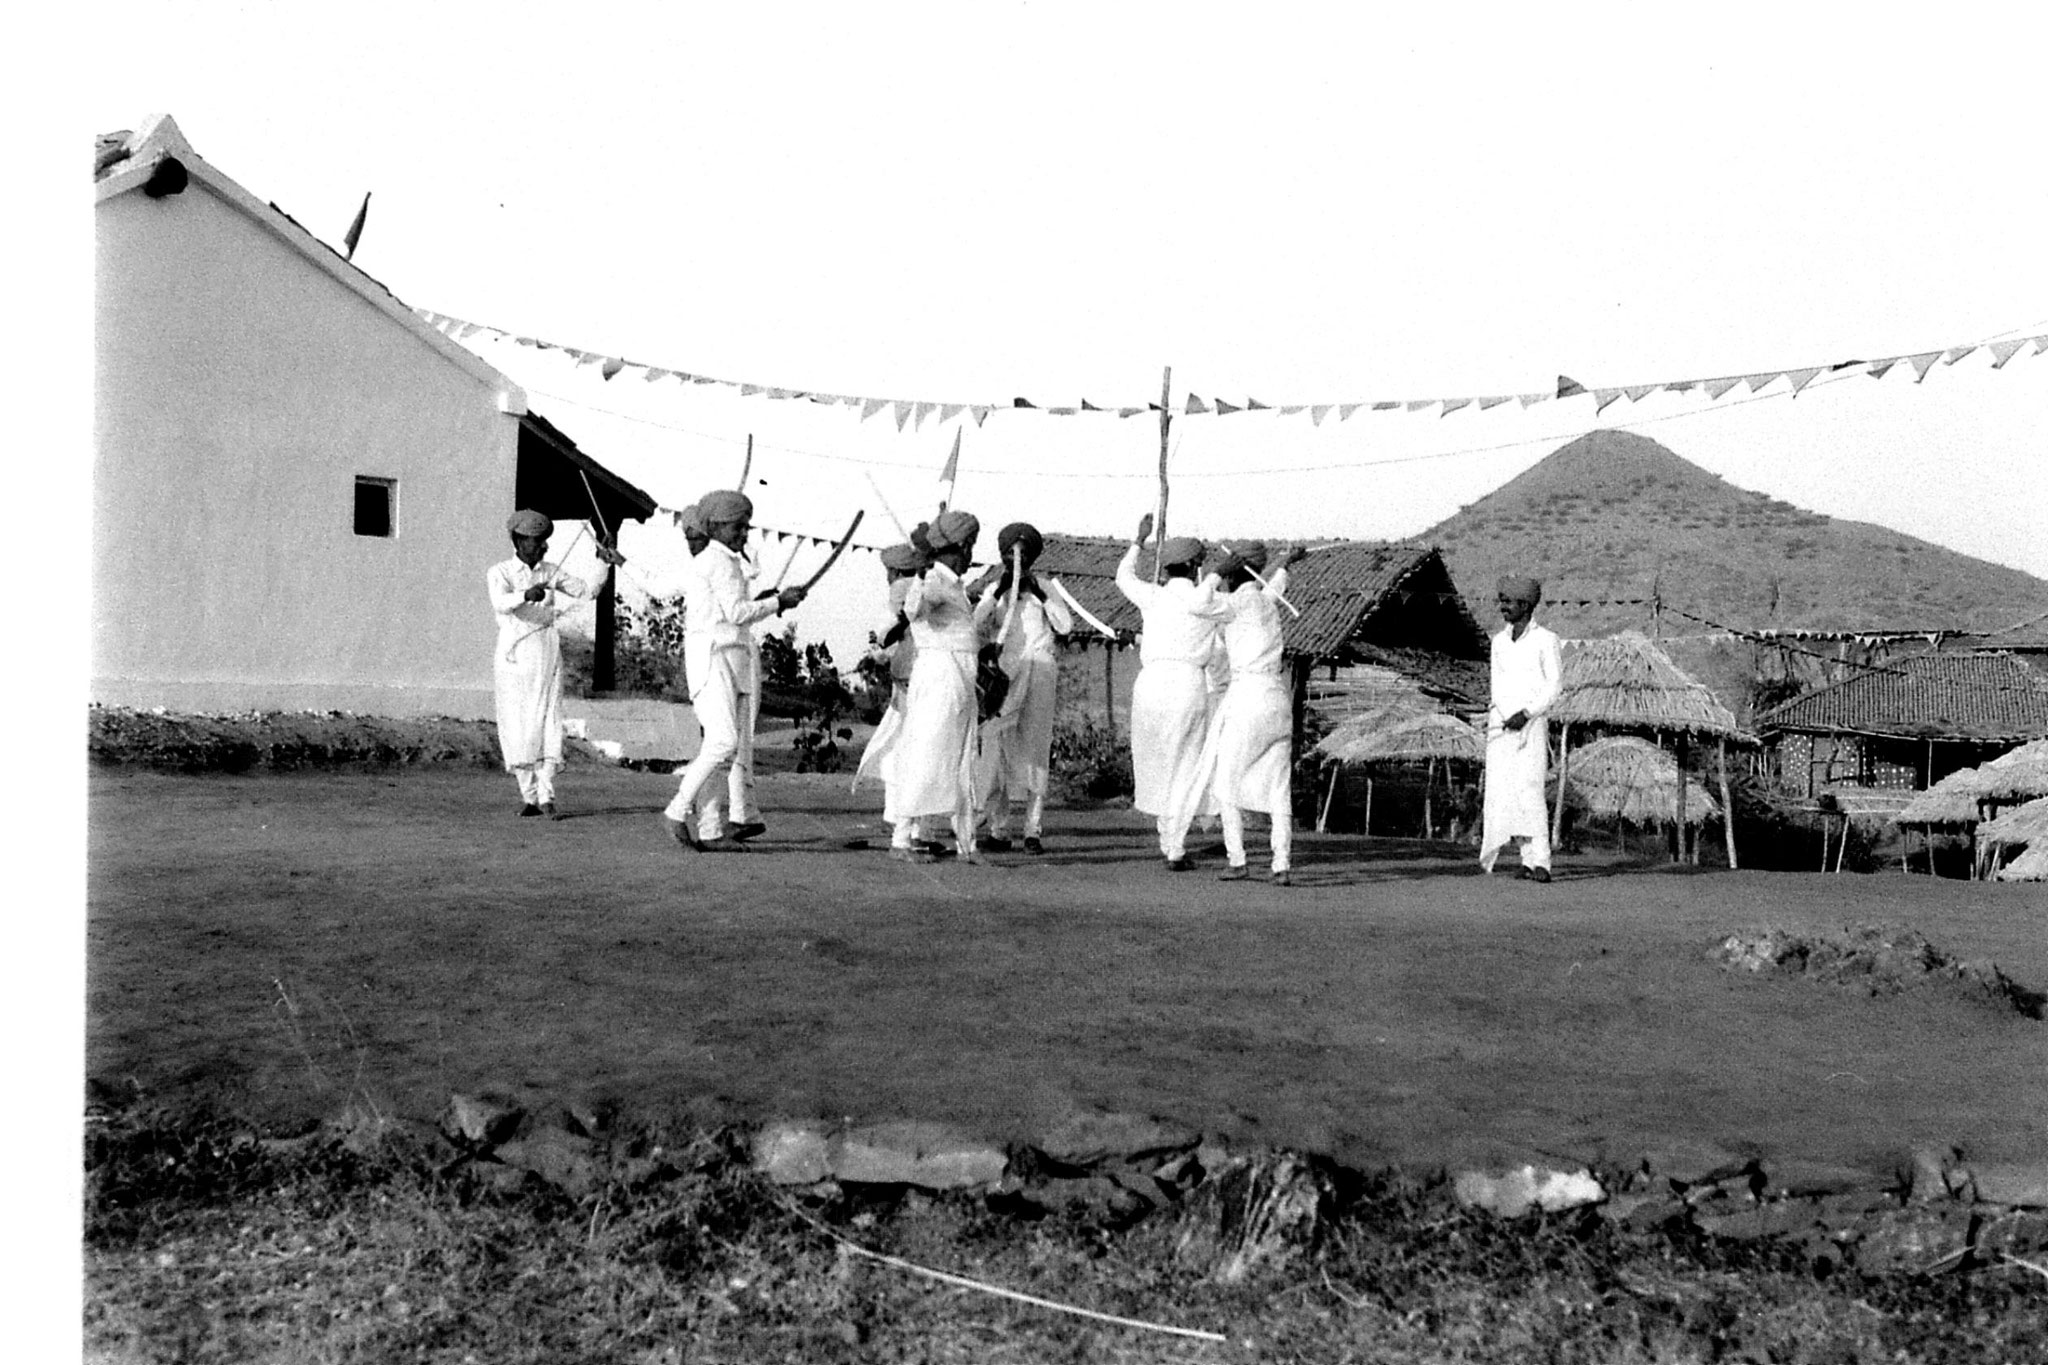 8/12/1989: 18: Udaipur, Shilp Gram Craft Centre